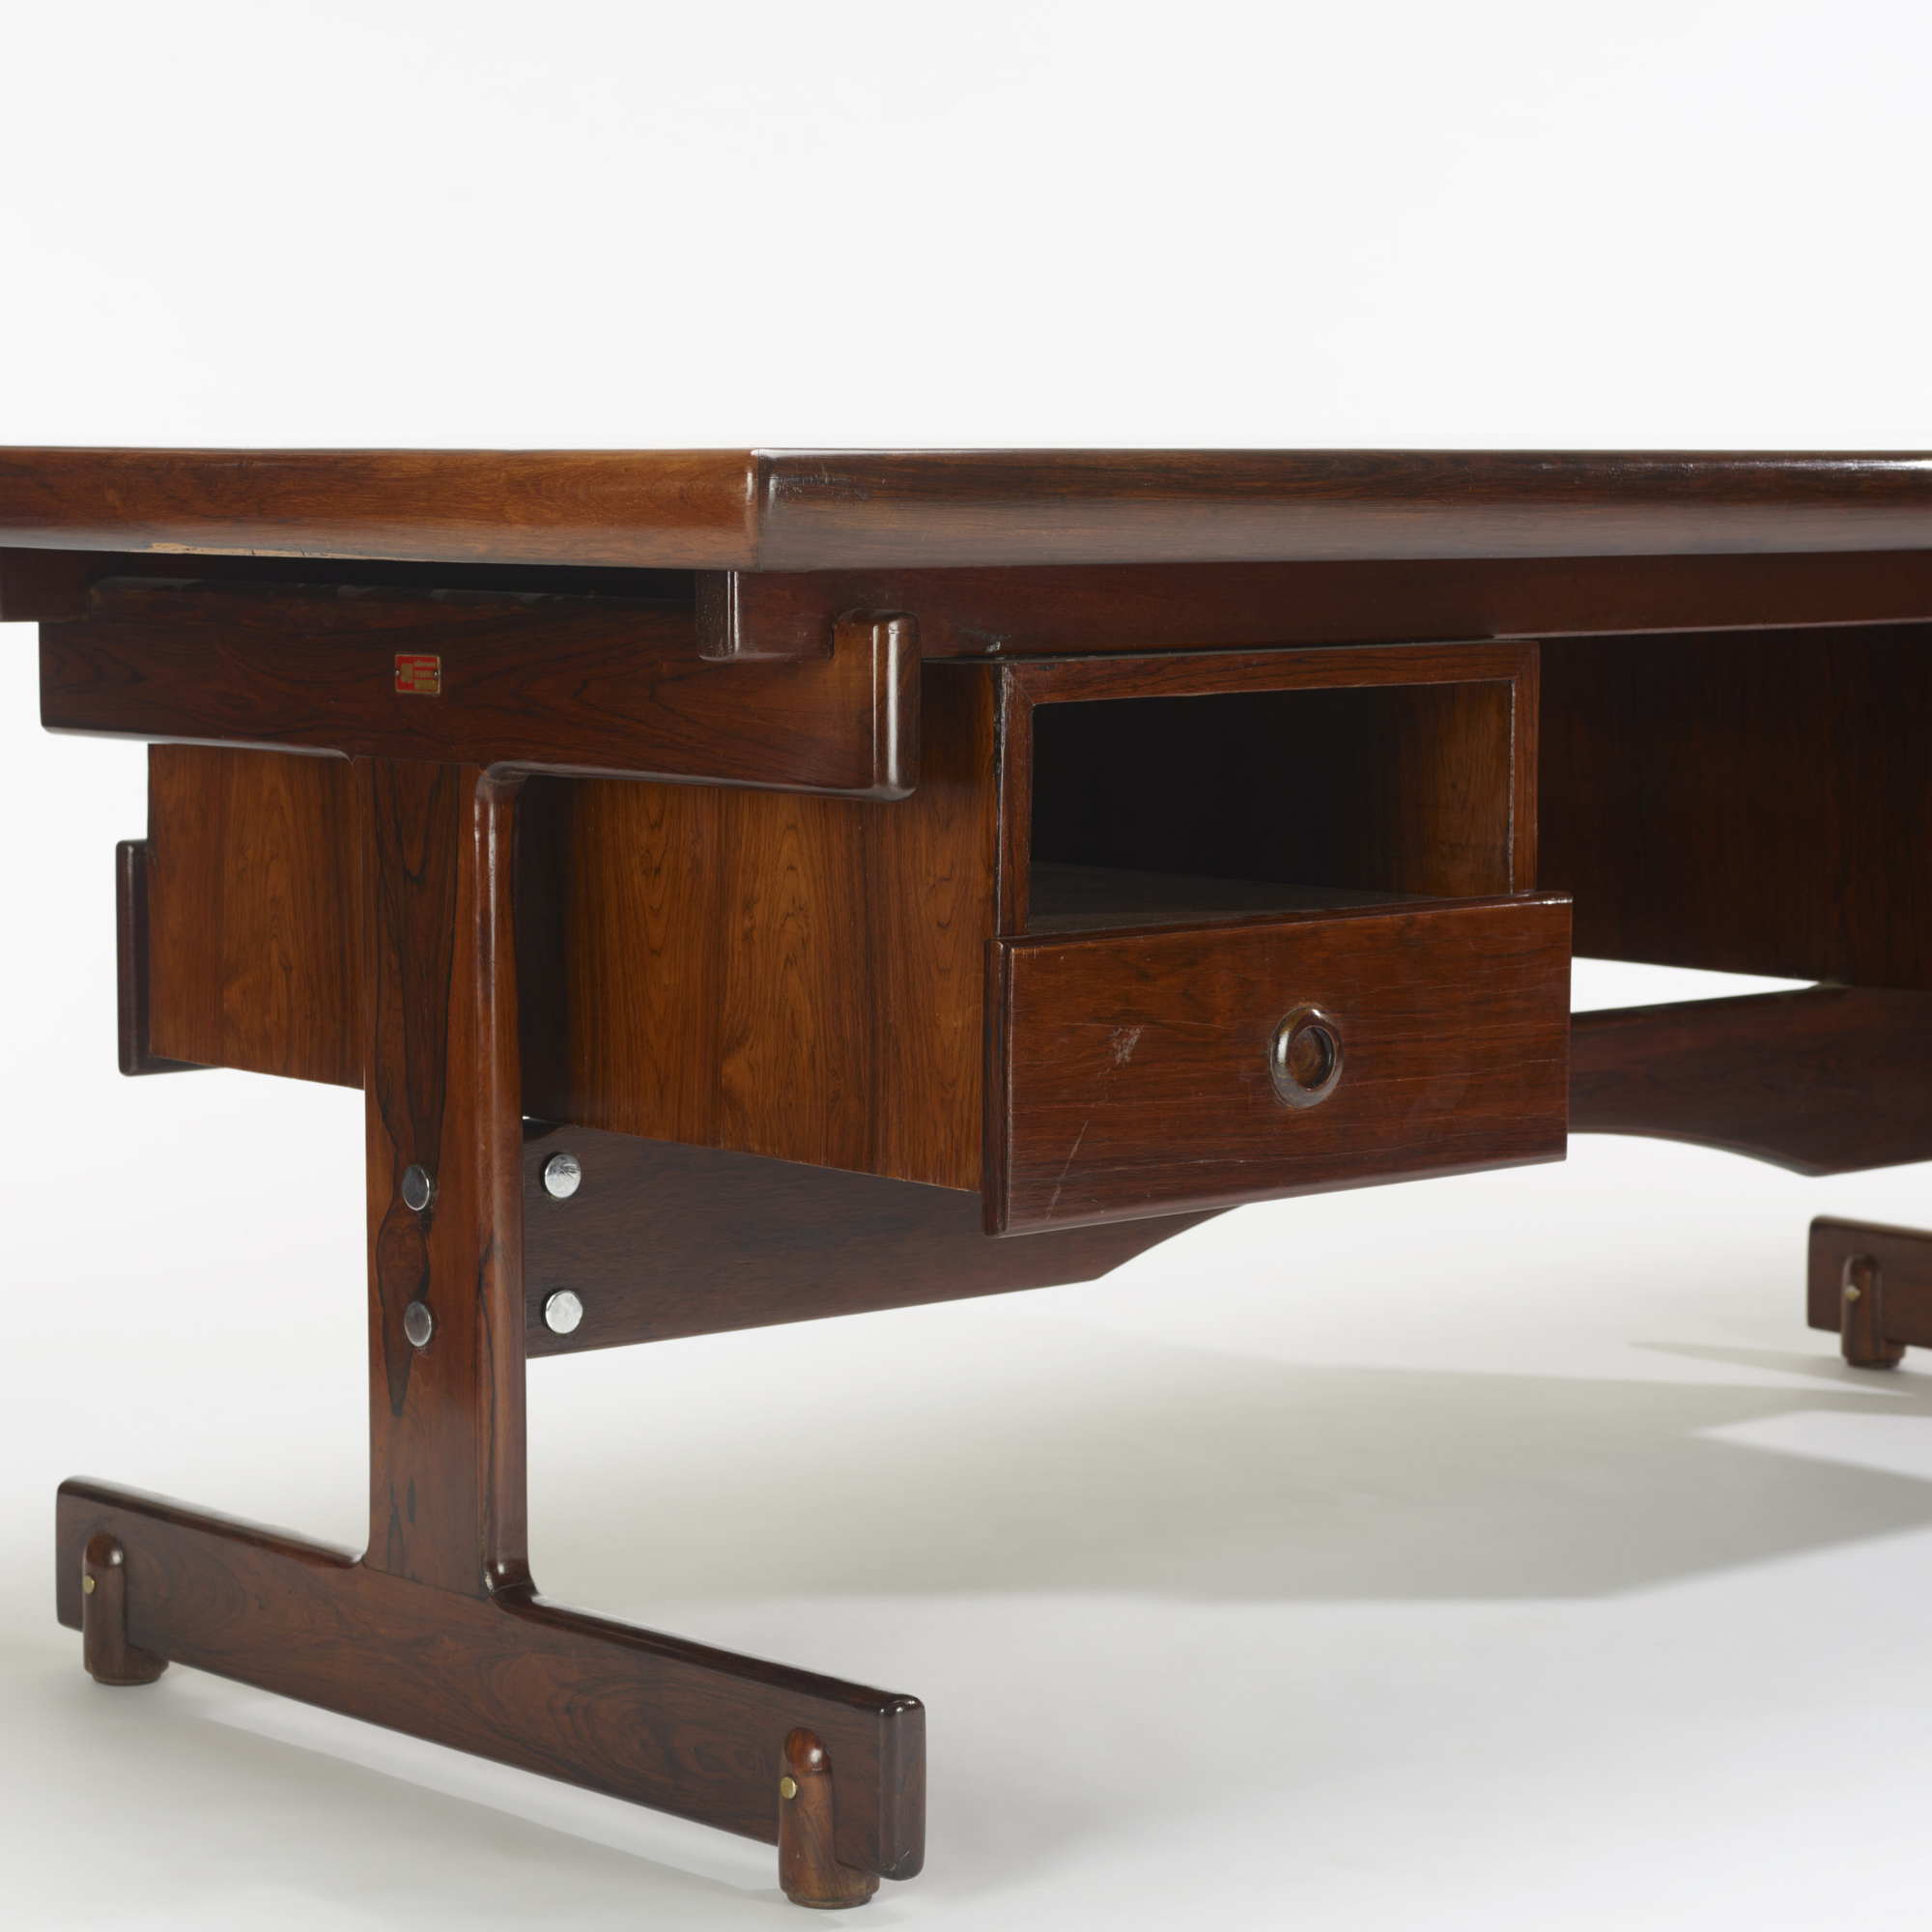 171: Sergio Rodrigues / Gordon desk (3 of 4)